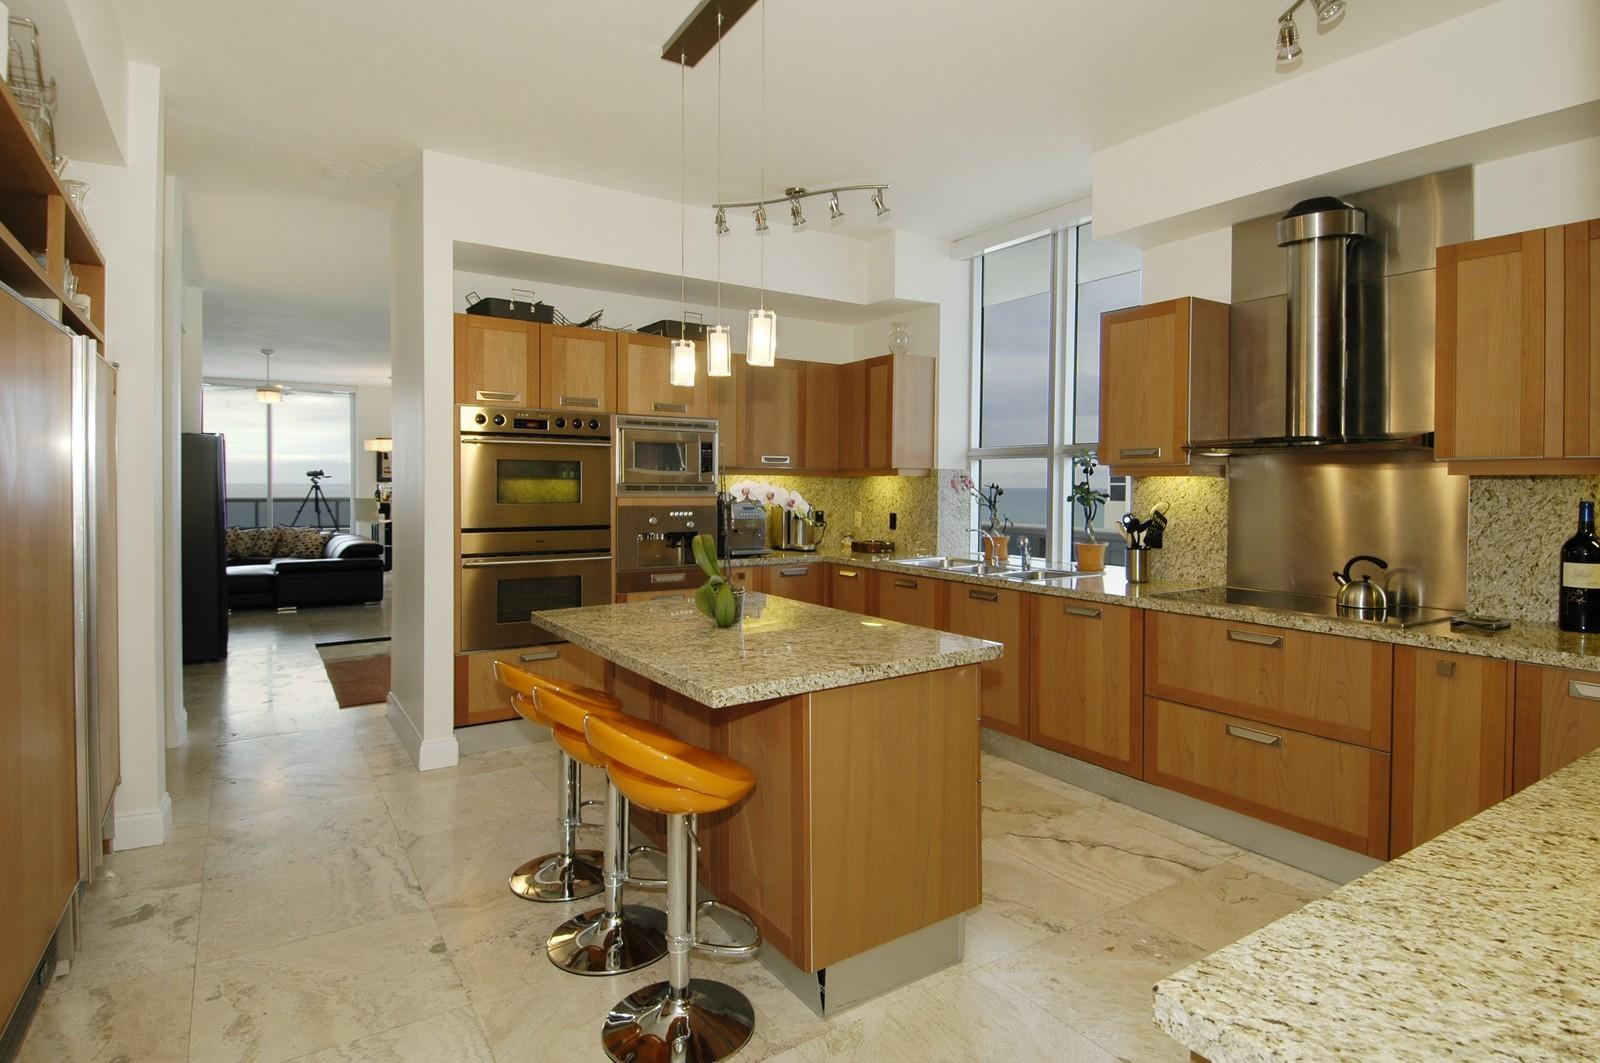 Real Estate Photography - 5801 Collins Ave, PH 1500, Miami Beach, FL, 33140 - Kitchen